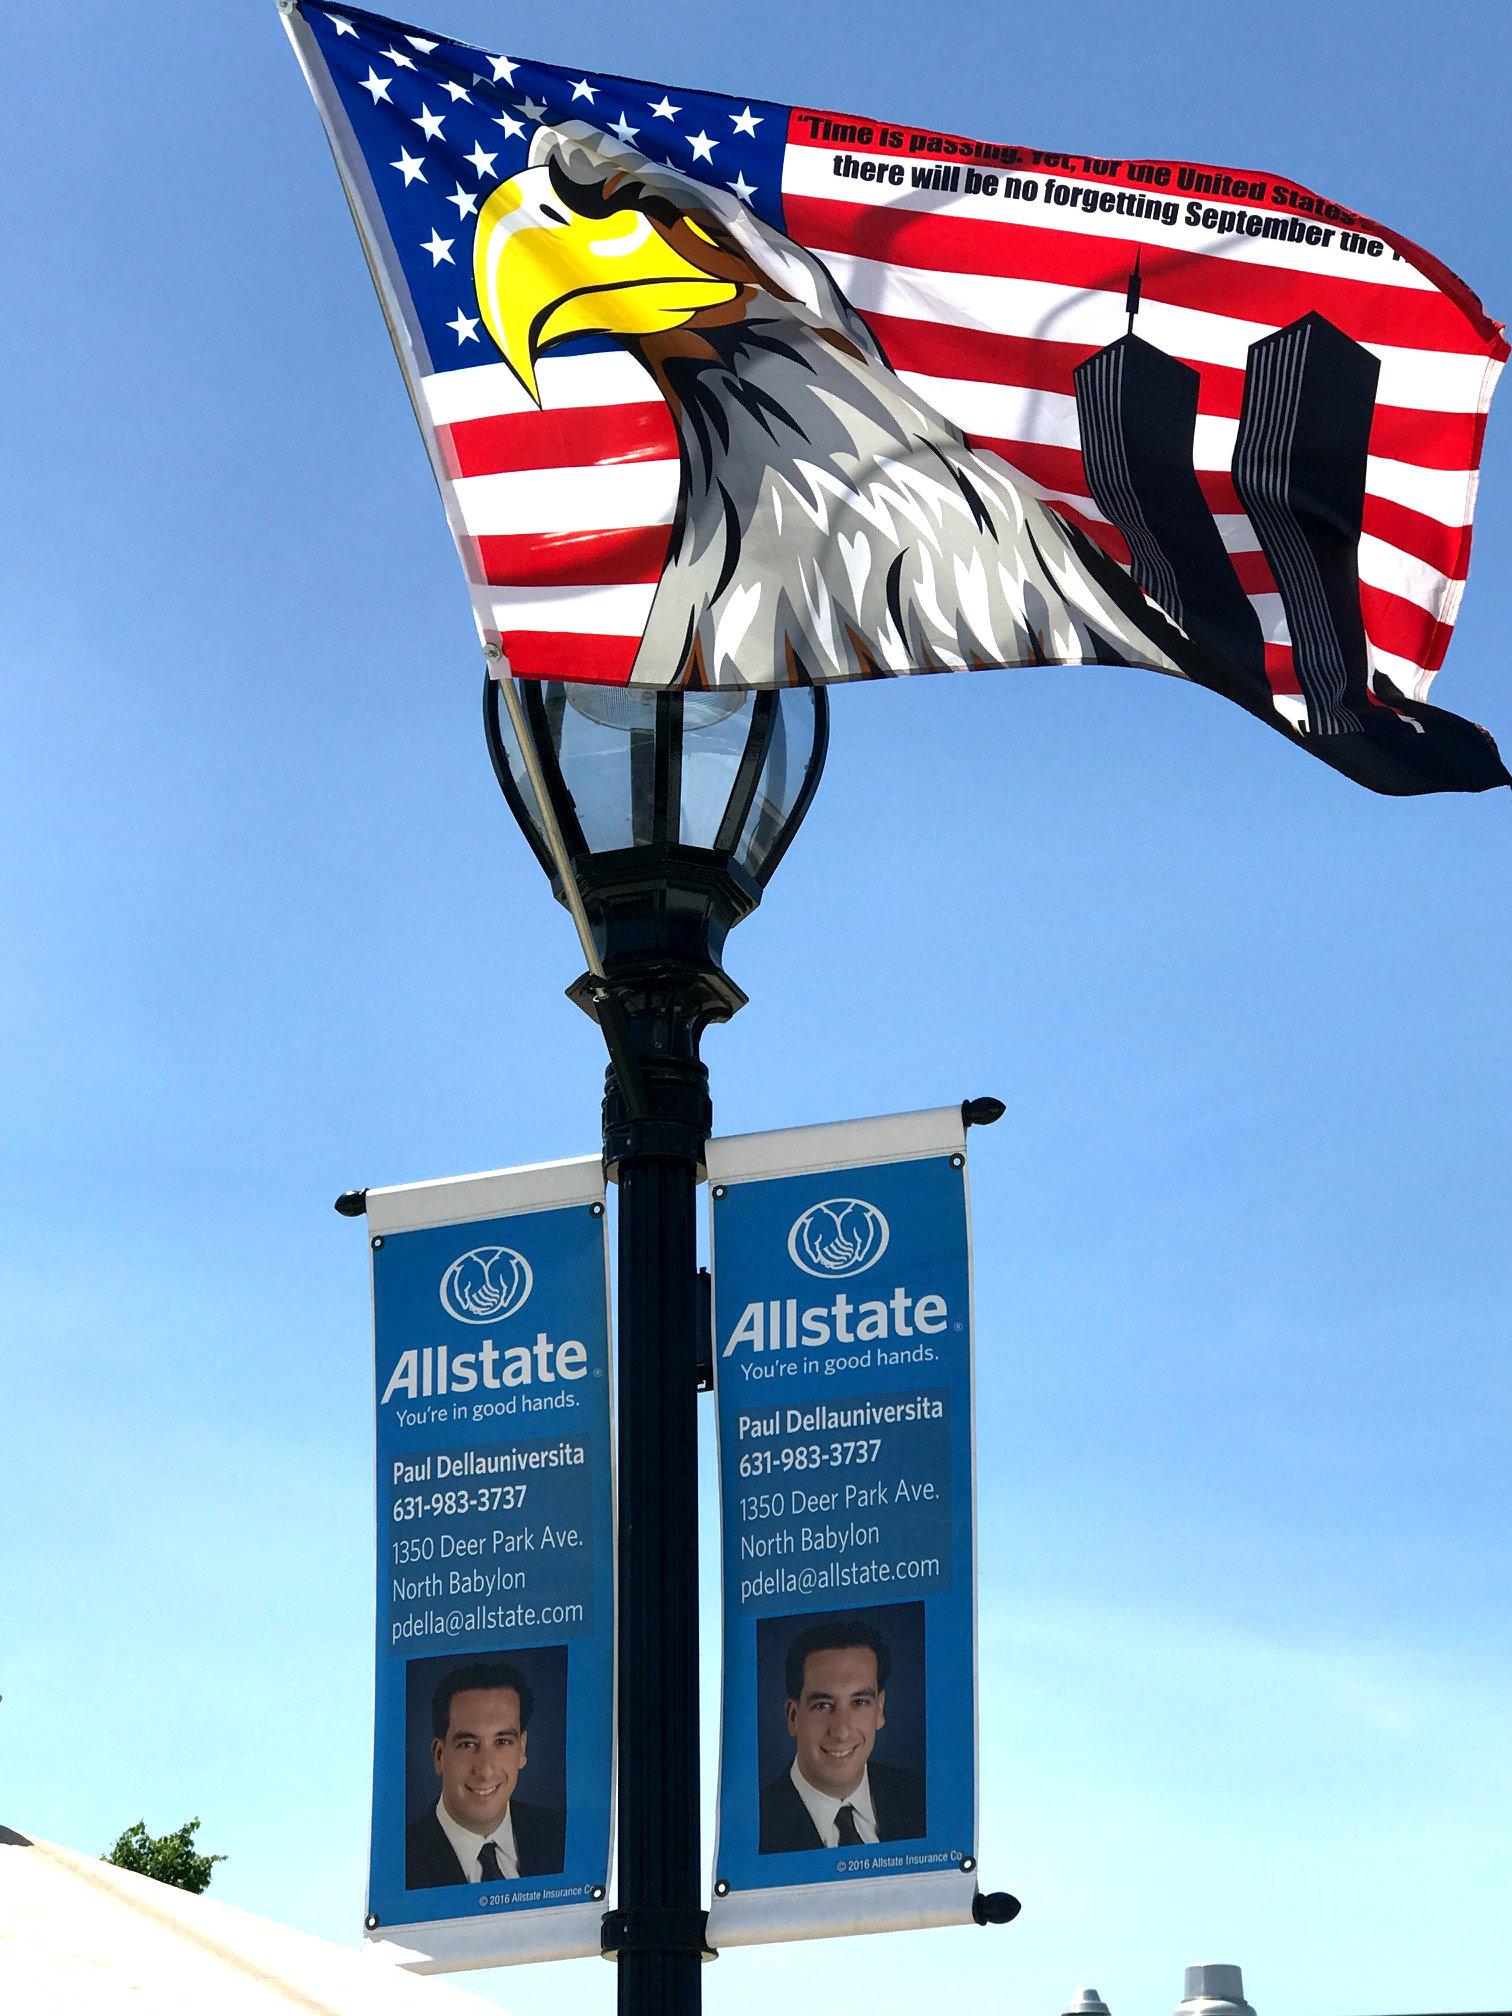 Paul J Dellauniversita: Allstate Insurance